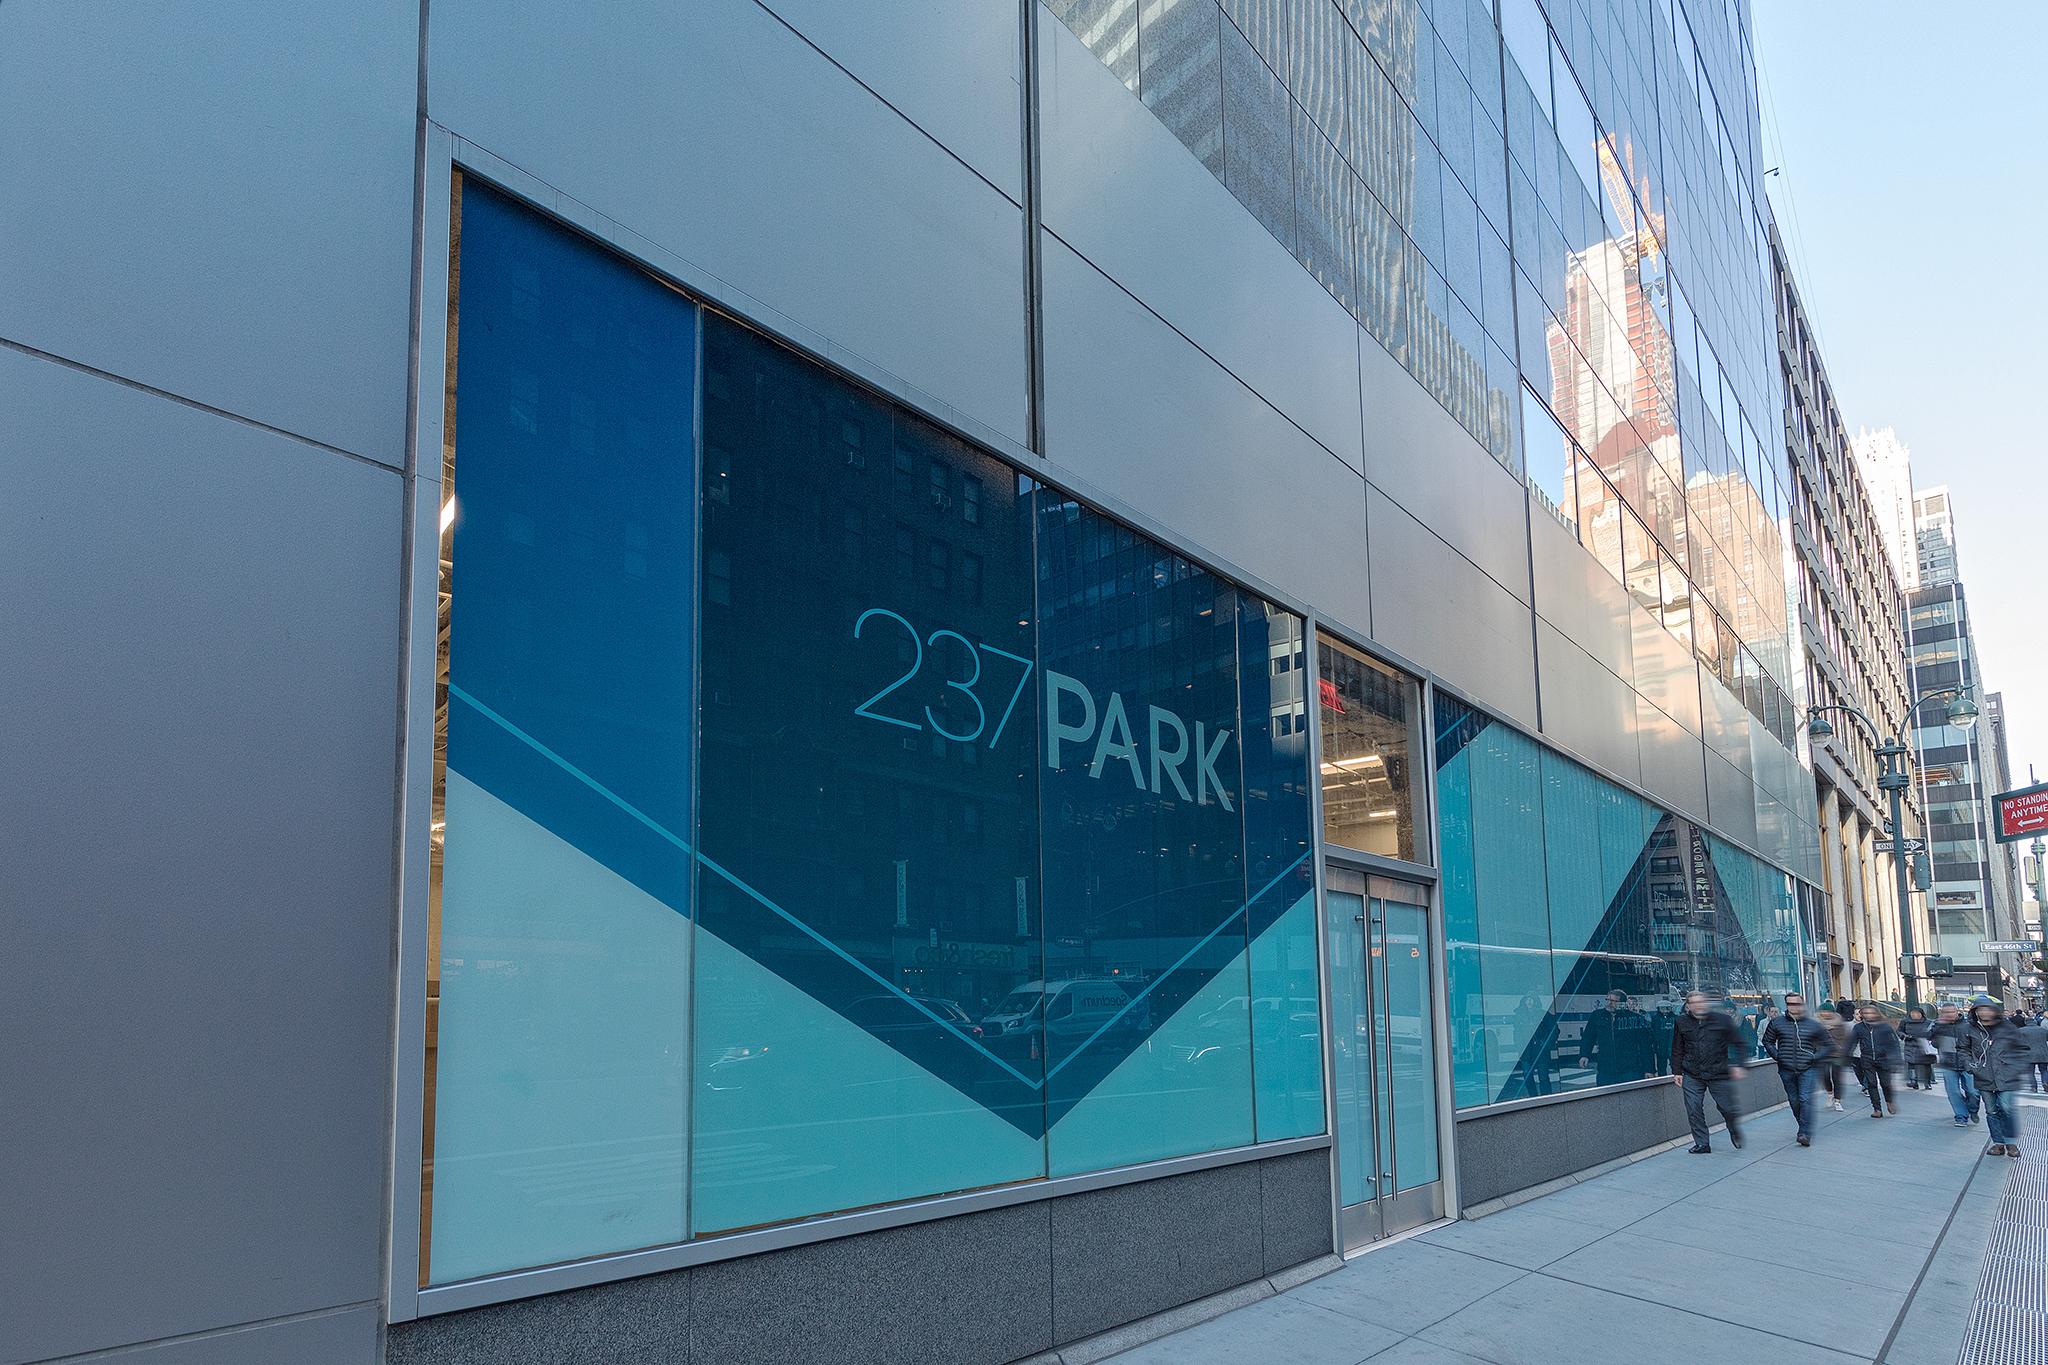 237 Park Ave Window